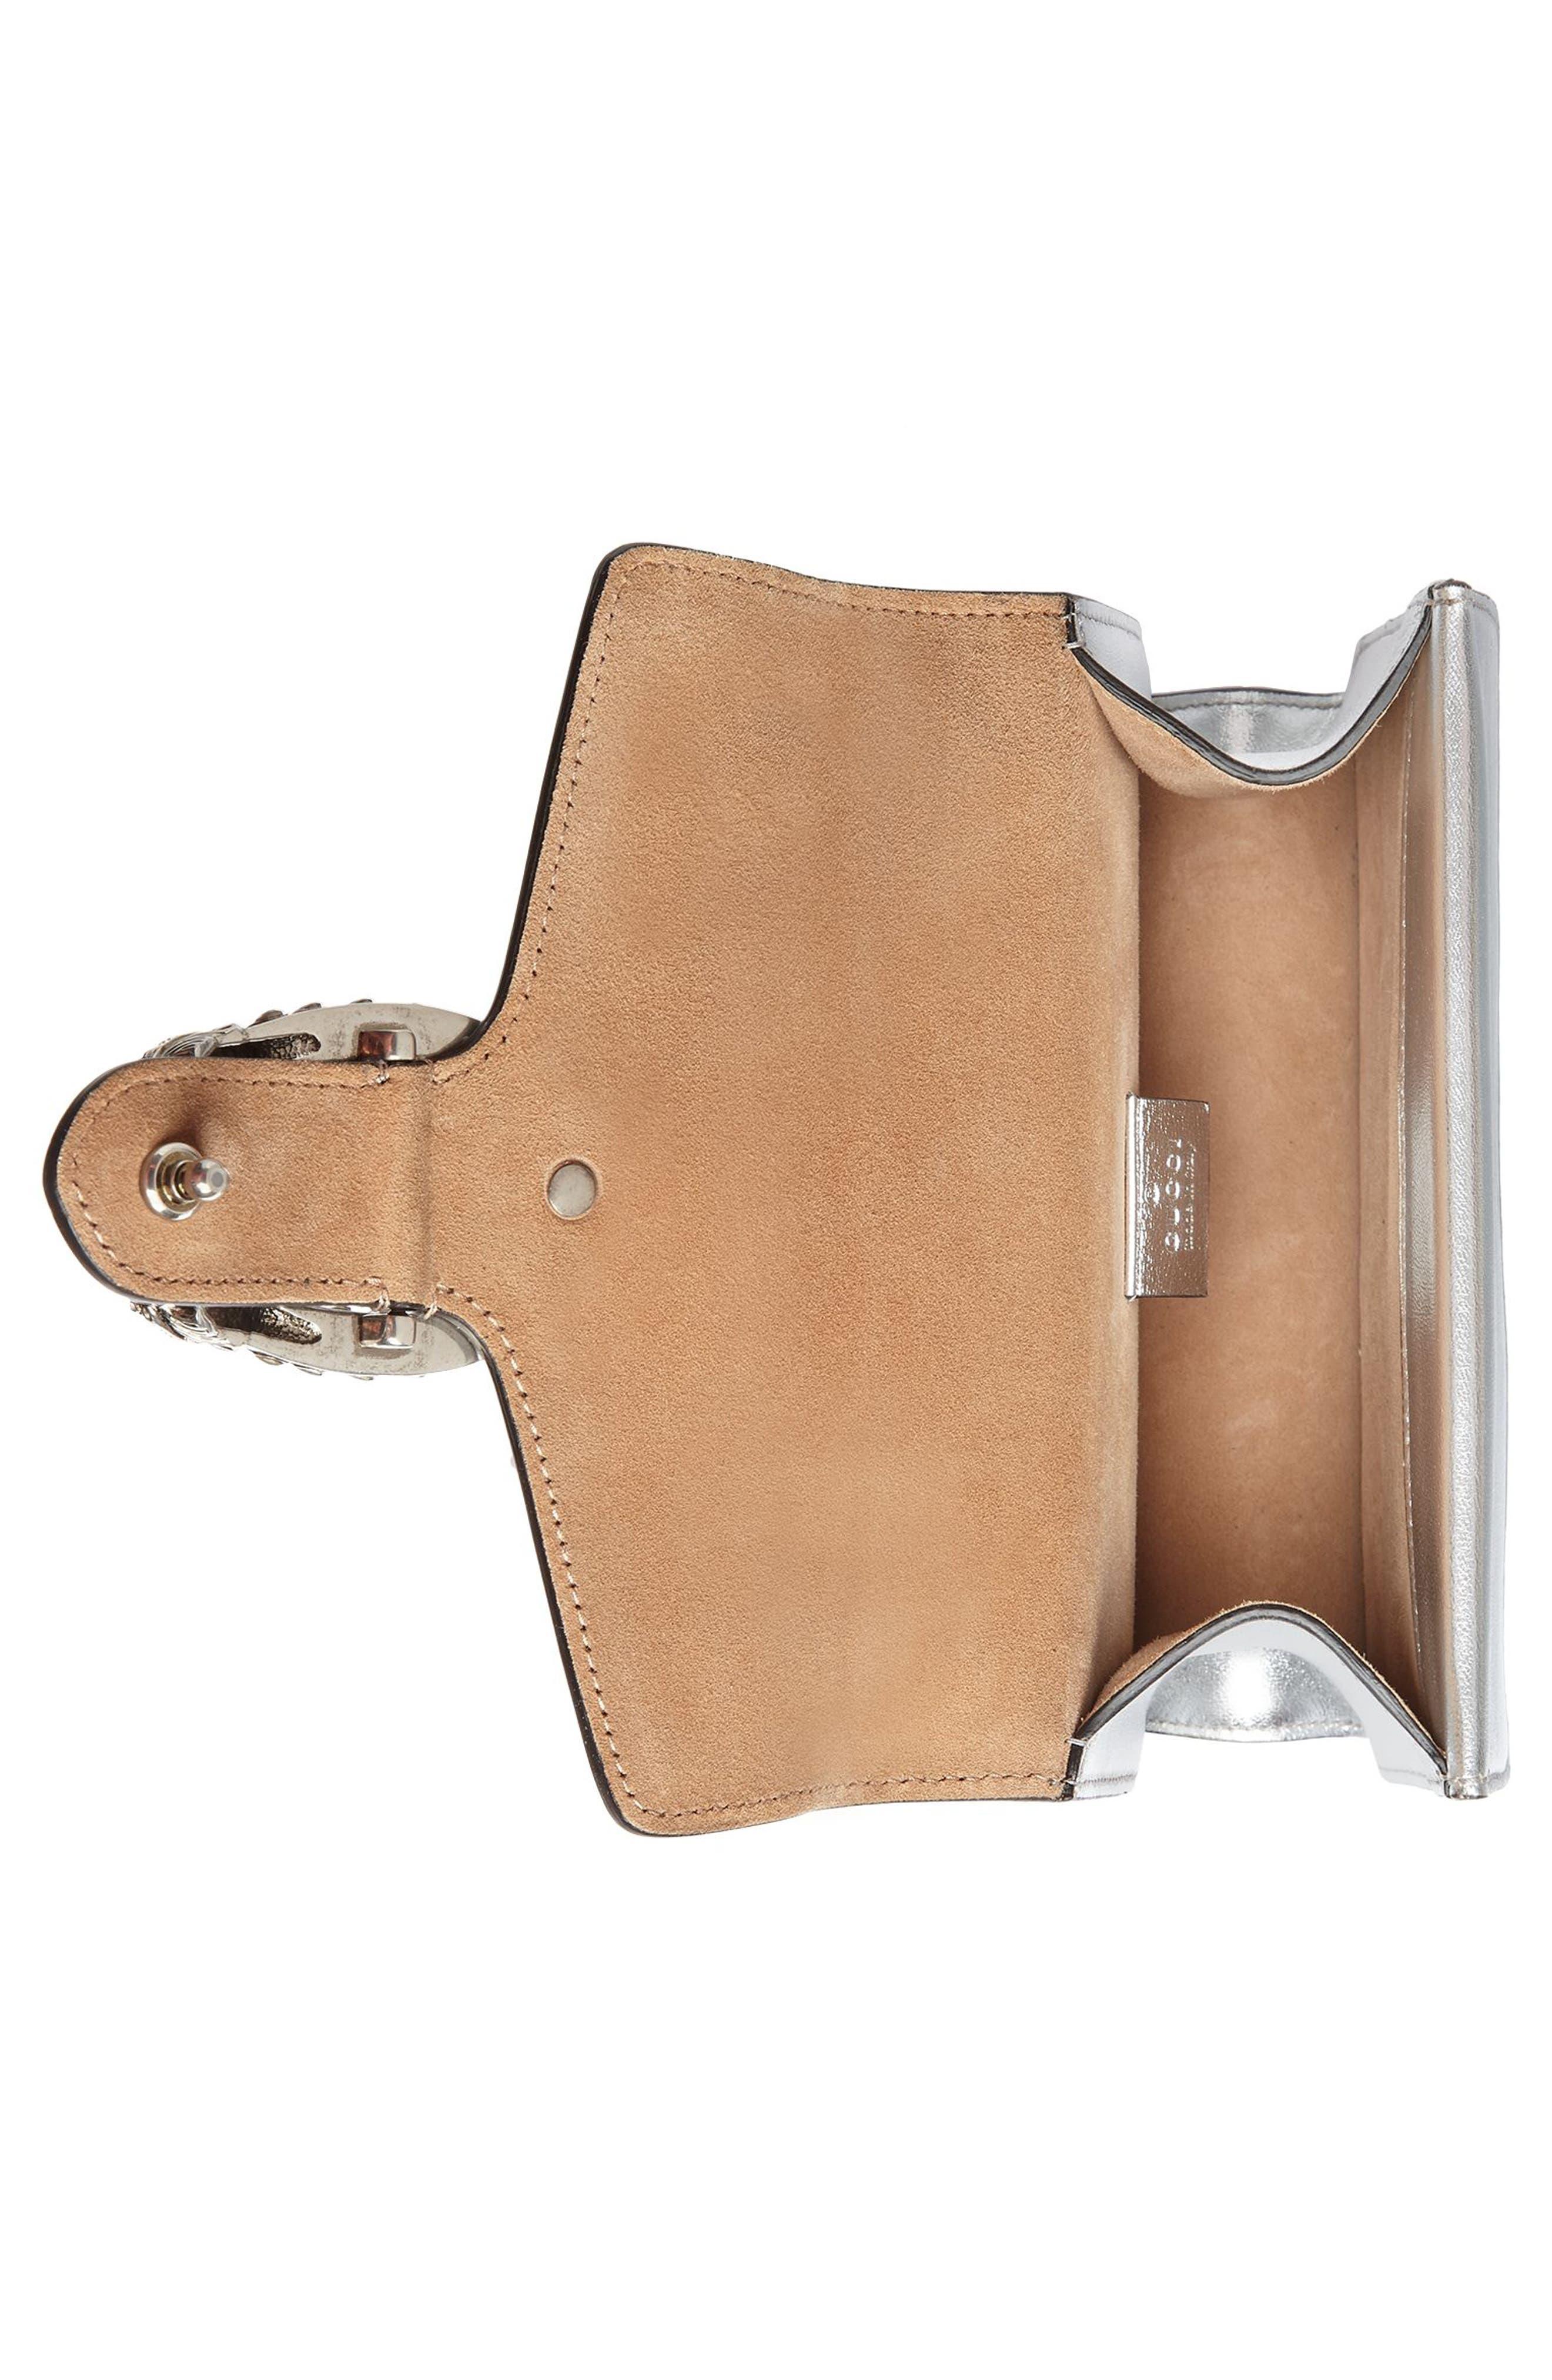 Mini Dionysus Metallic Leather Shoulder Bag,                             Alternate thumbnail 3, color,                             Argento/Blk Diamond